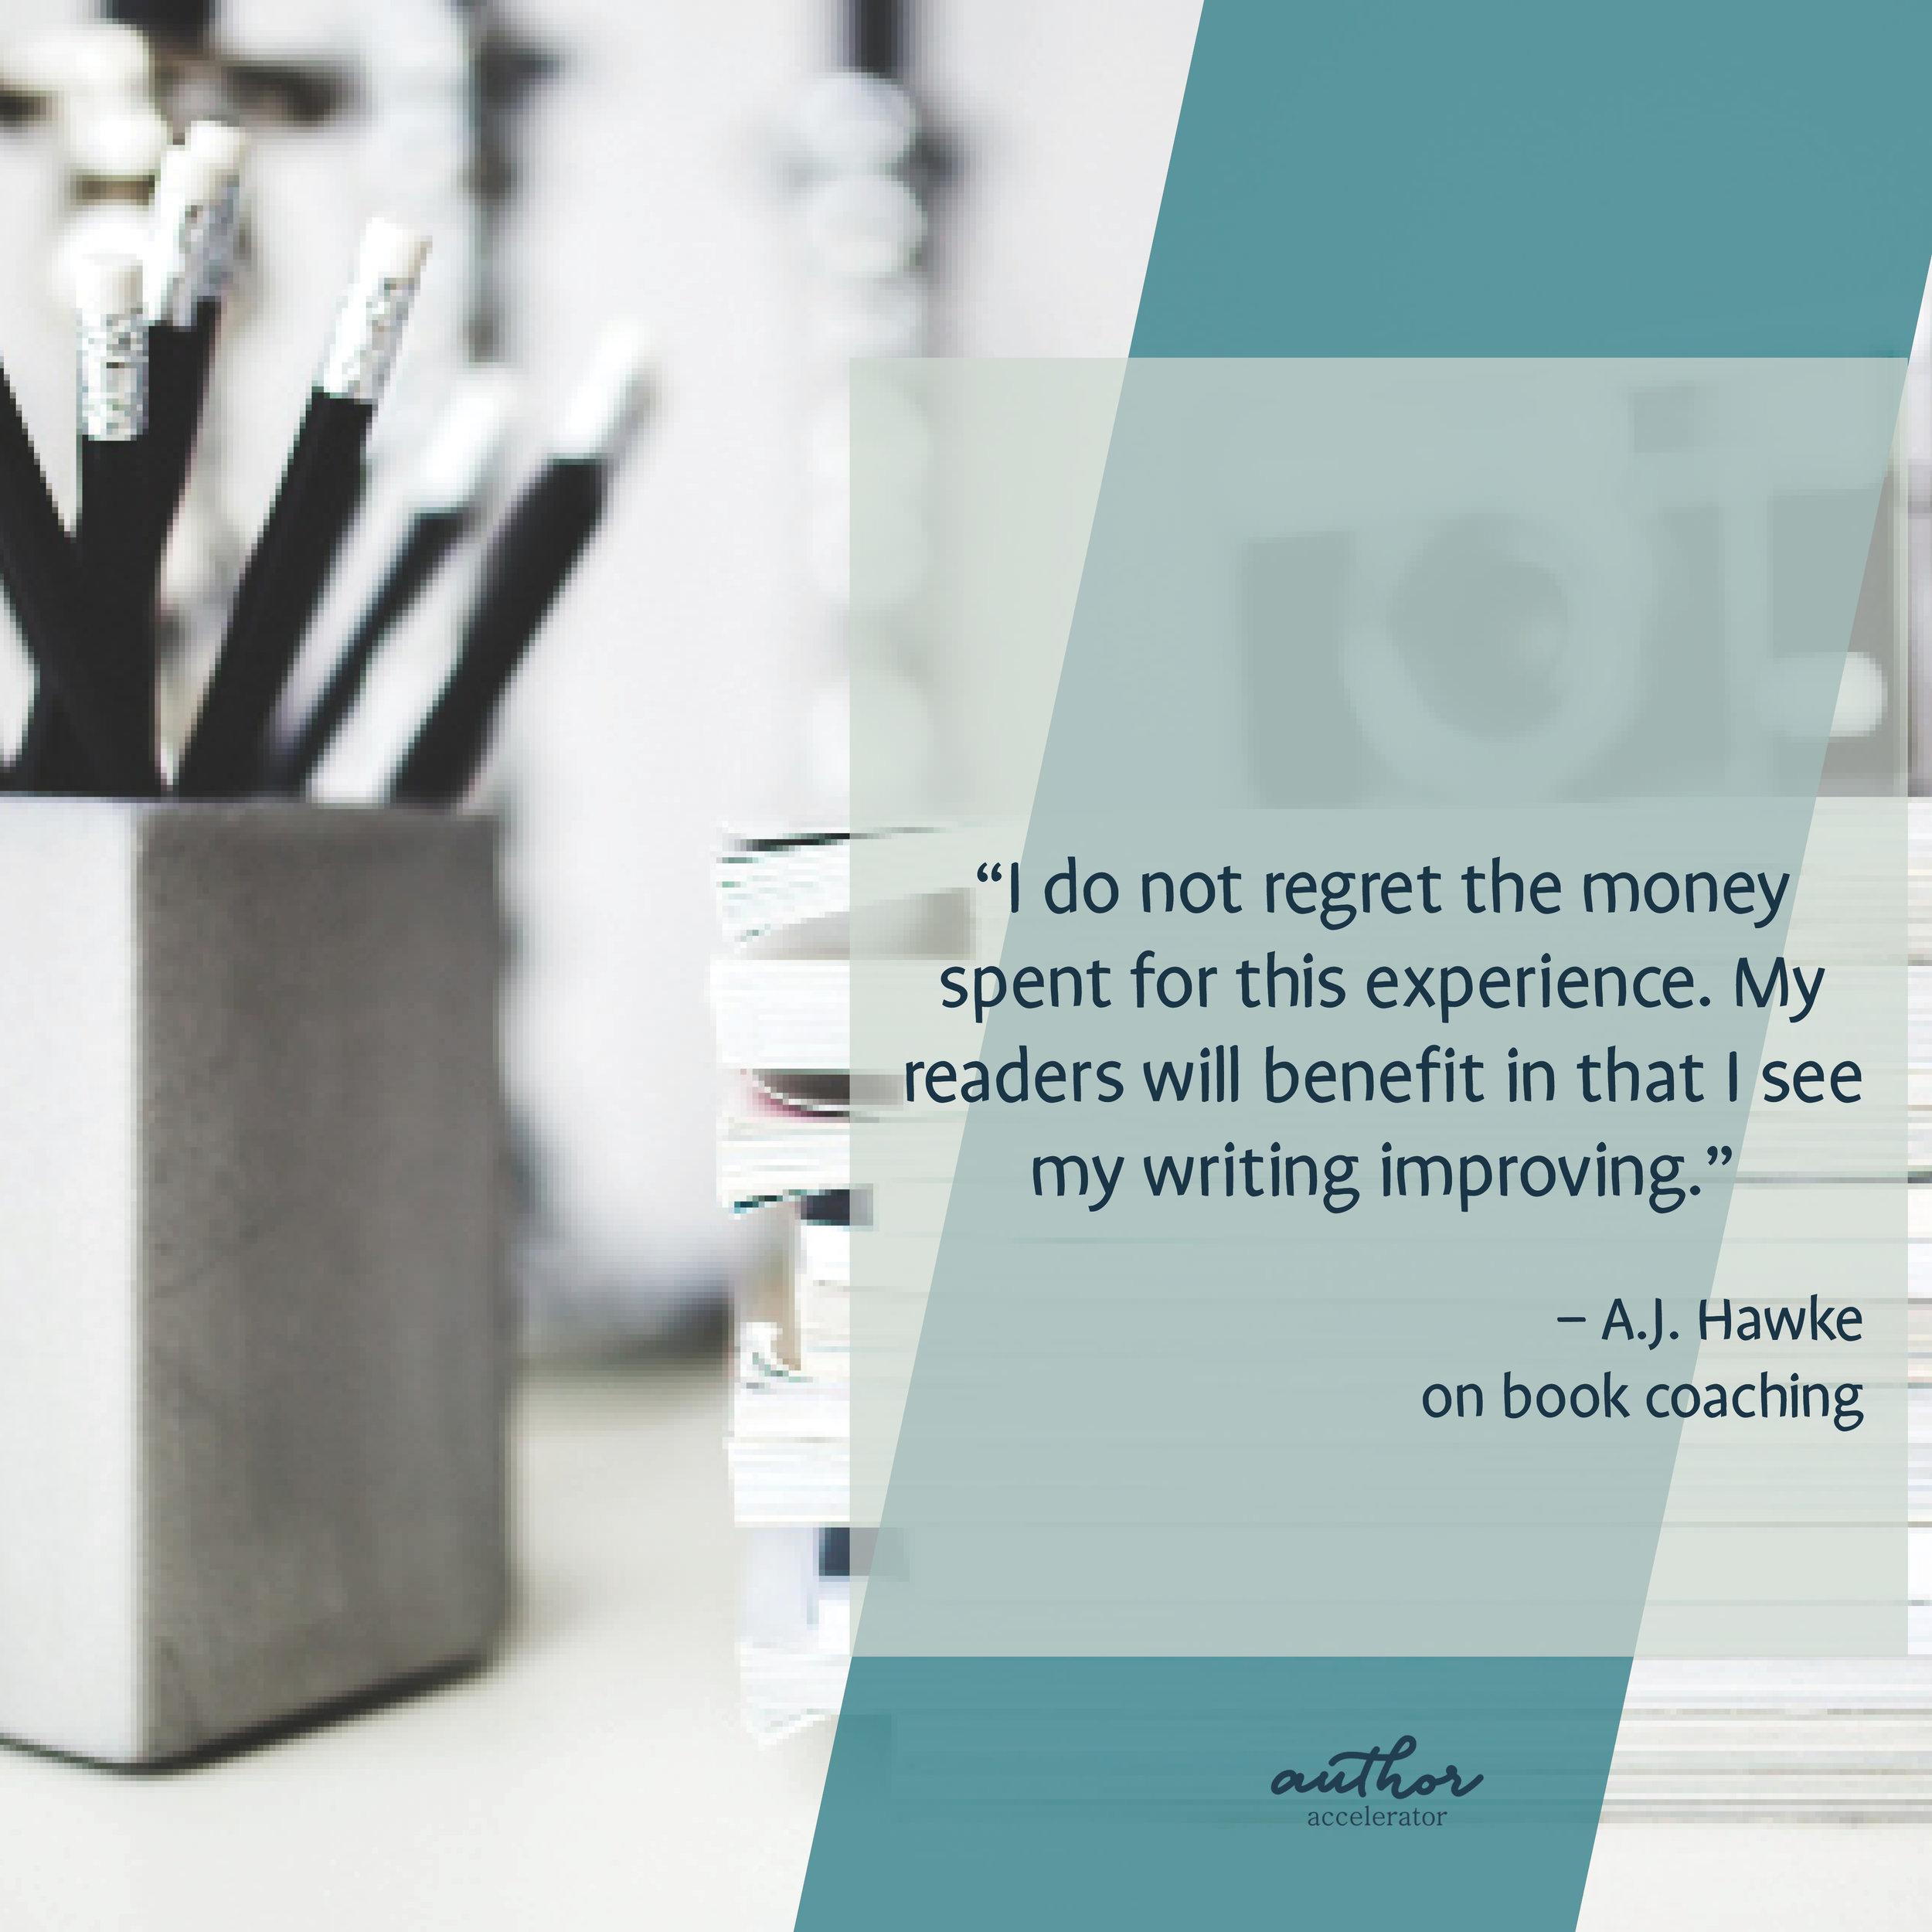 book_coaching_aj_hawke_barbara_kee.jpg